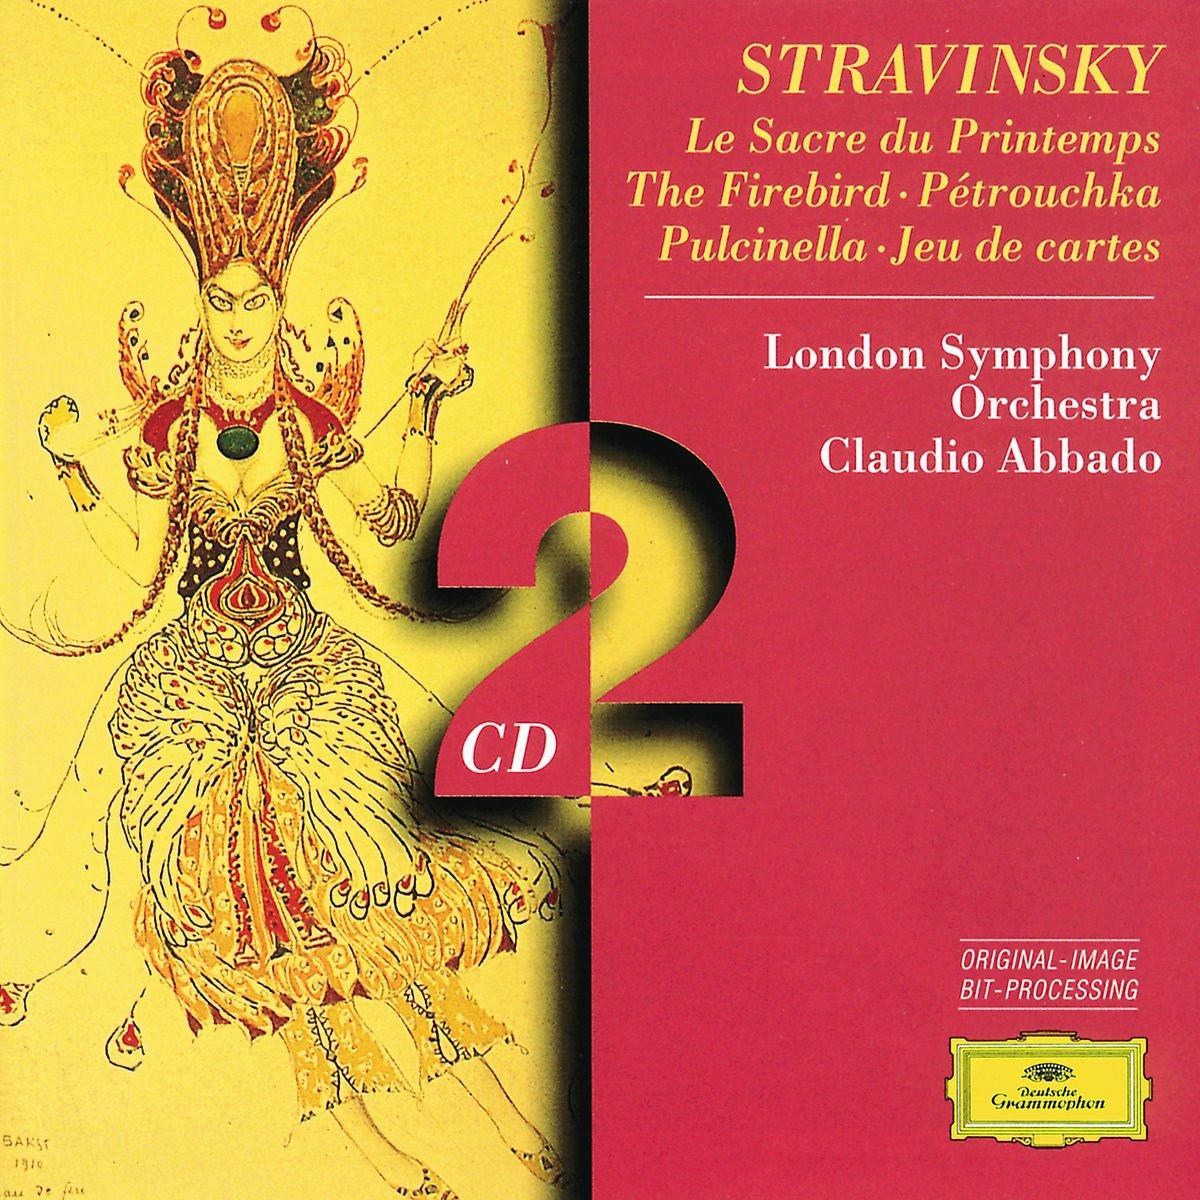 Stravinsky: Le Sacre du printemps (Rite of Spring) / The Firebird / Jeu de cartes / Petrouchka / Pulcinella by CD